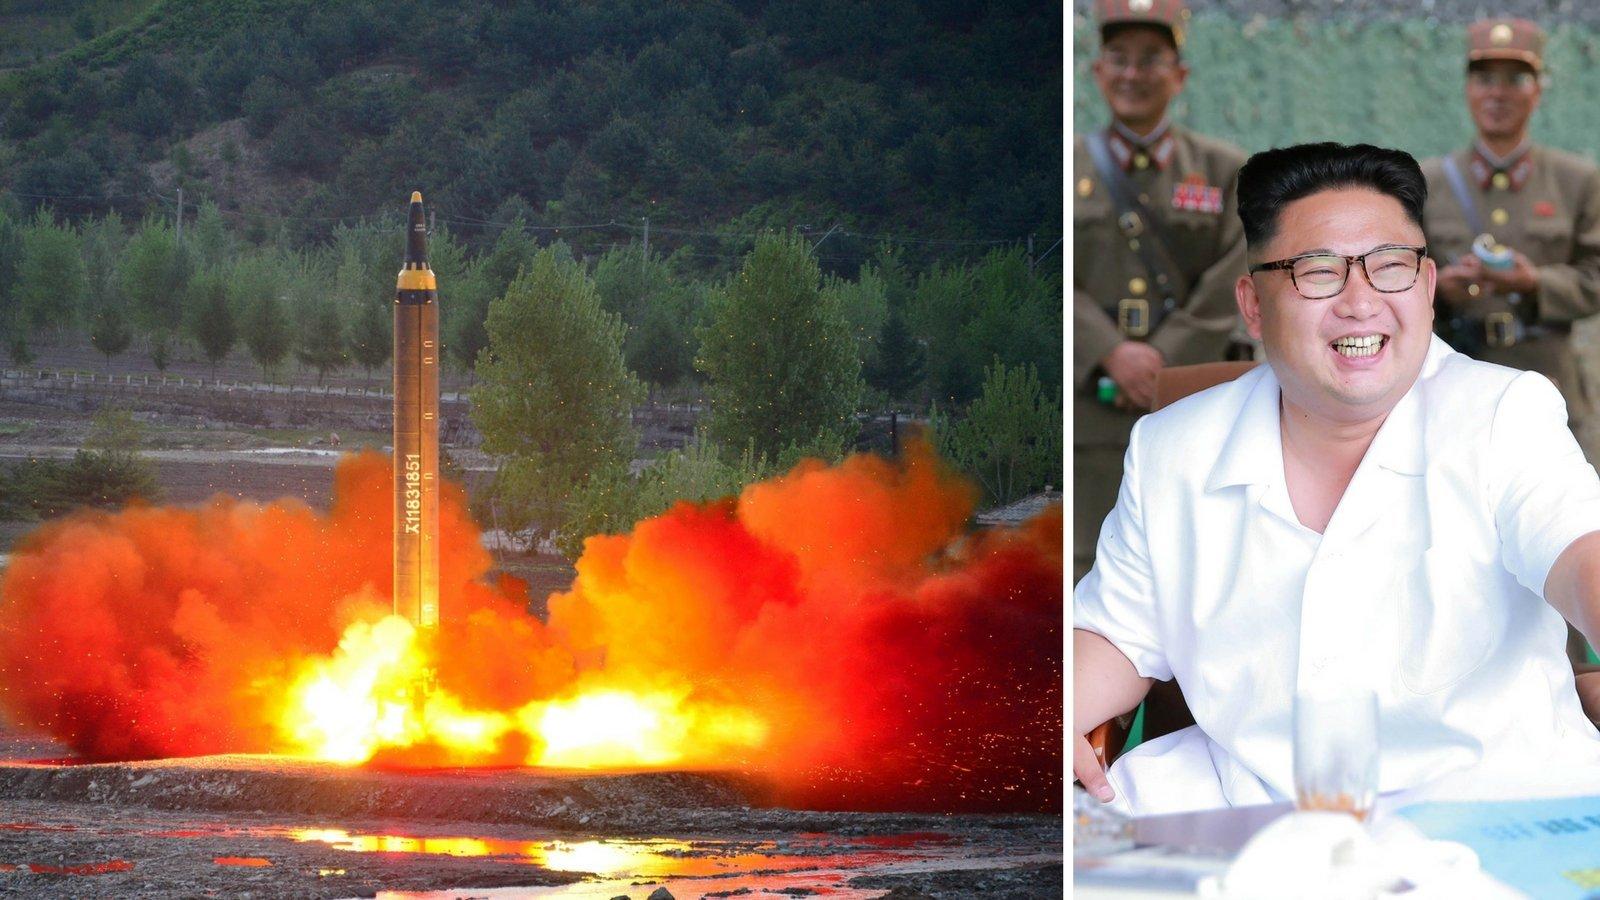 Nordkorea verkündet Stopp der Atom- und Raketentests: Was das